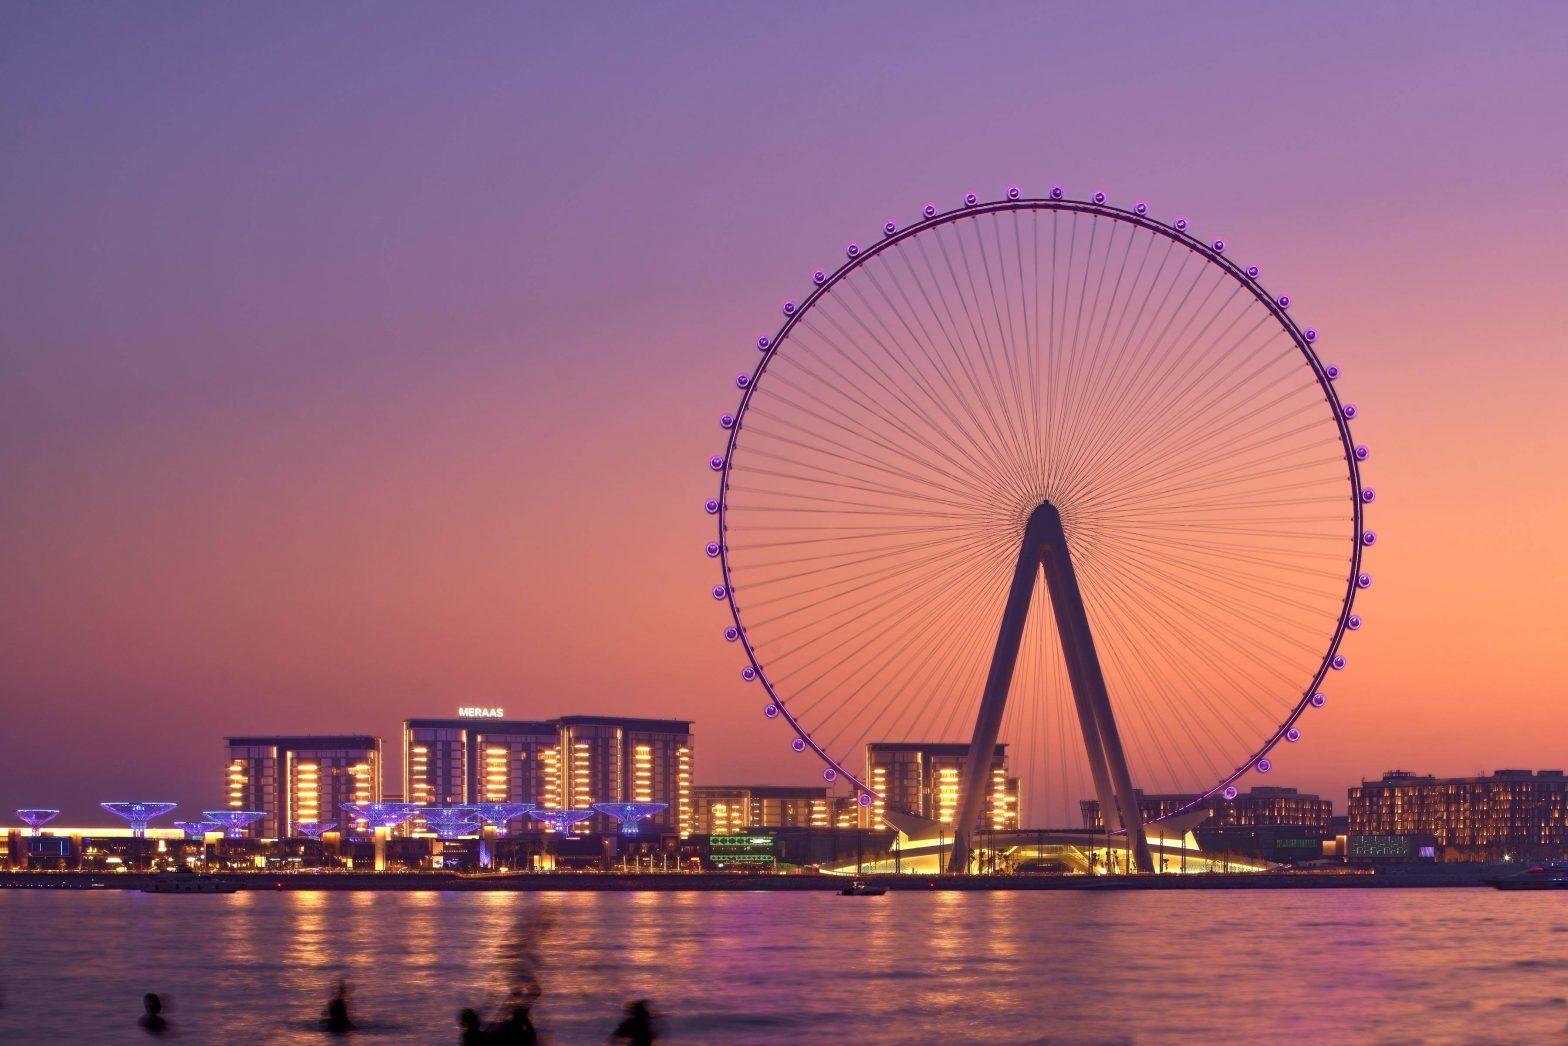 UAE announces the world's tallest observation wheel 'Ain Dubai'_40.1